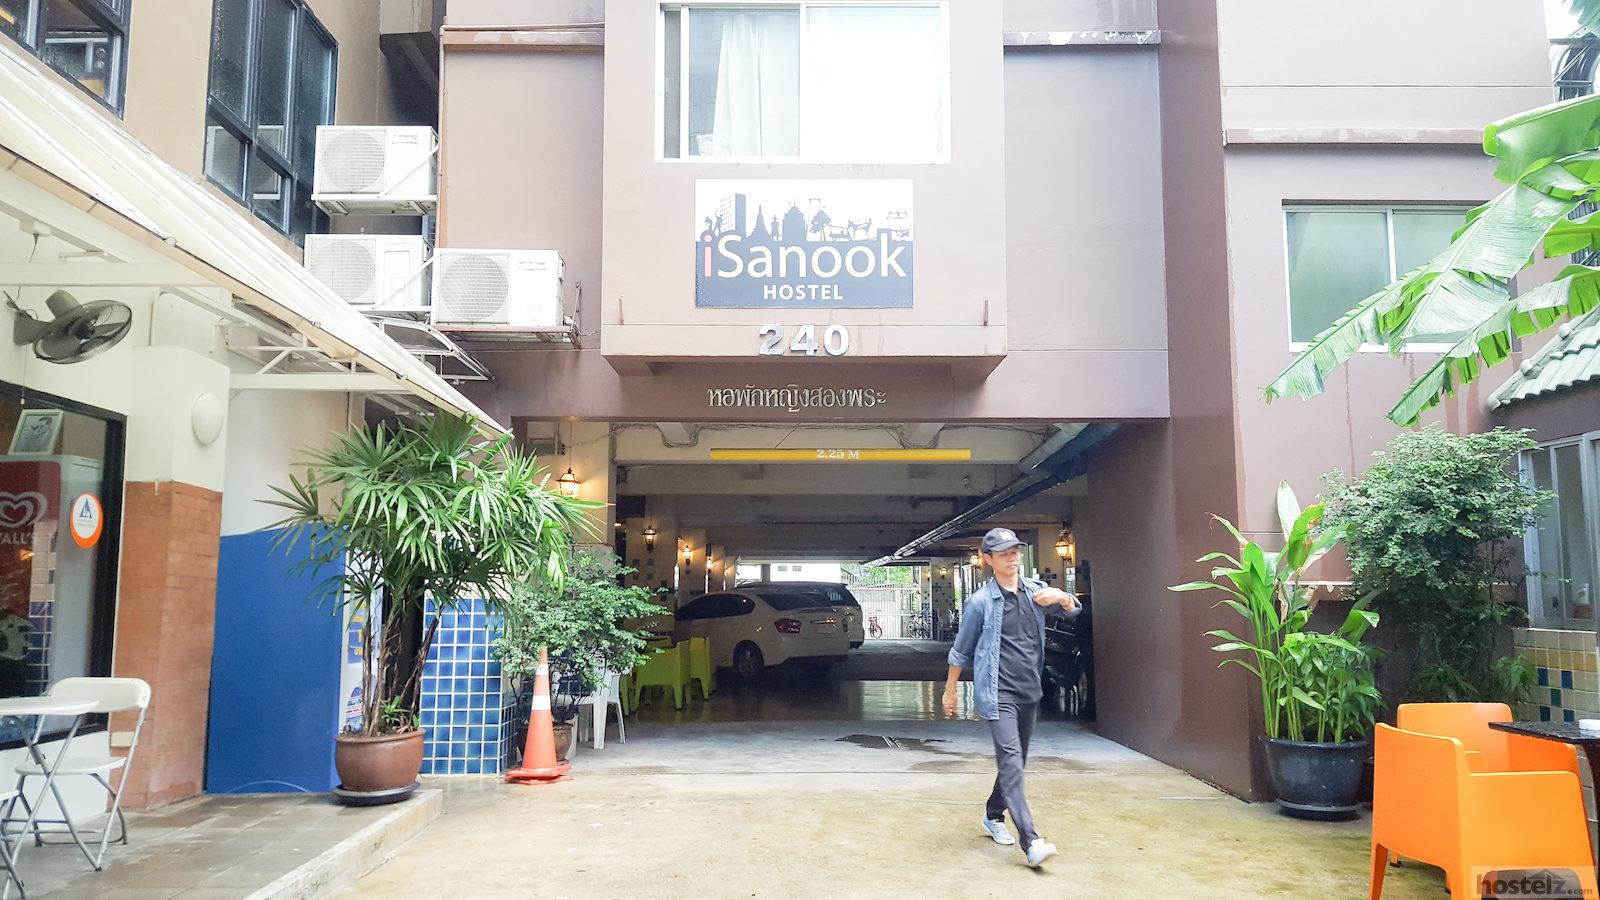 ISanook Hostel - Top 9 best hostels in Bangkok